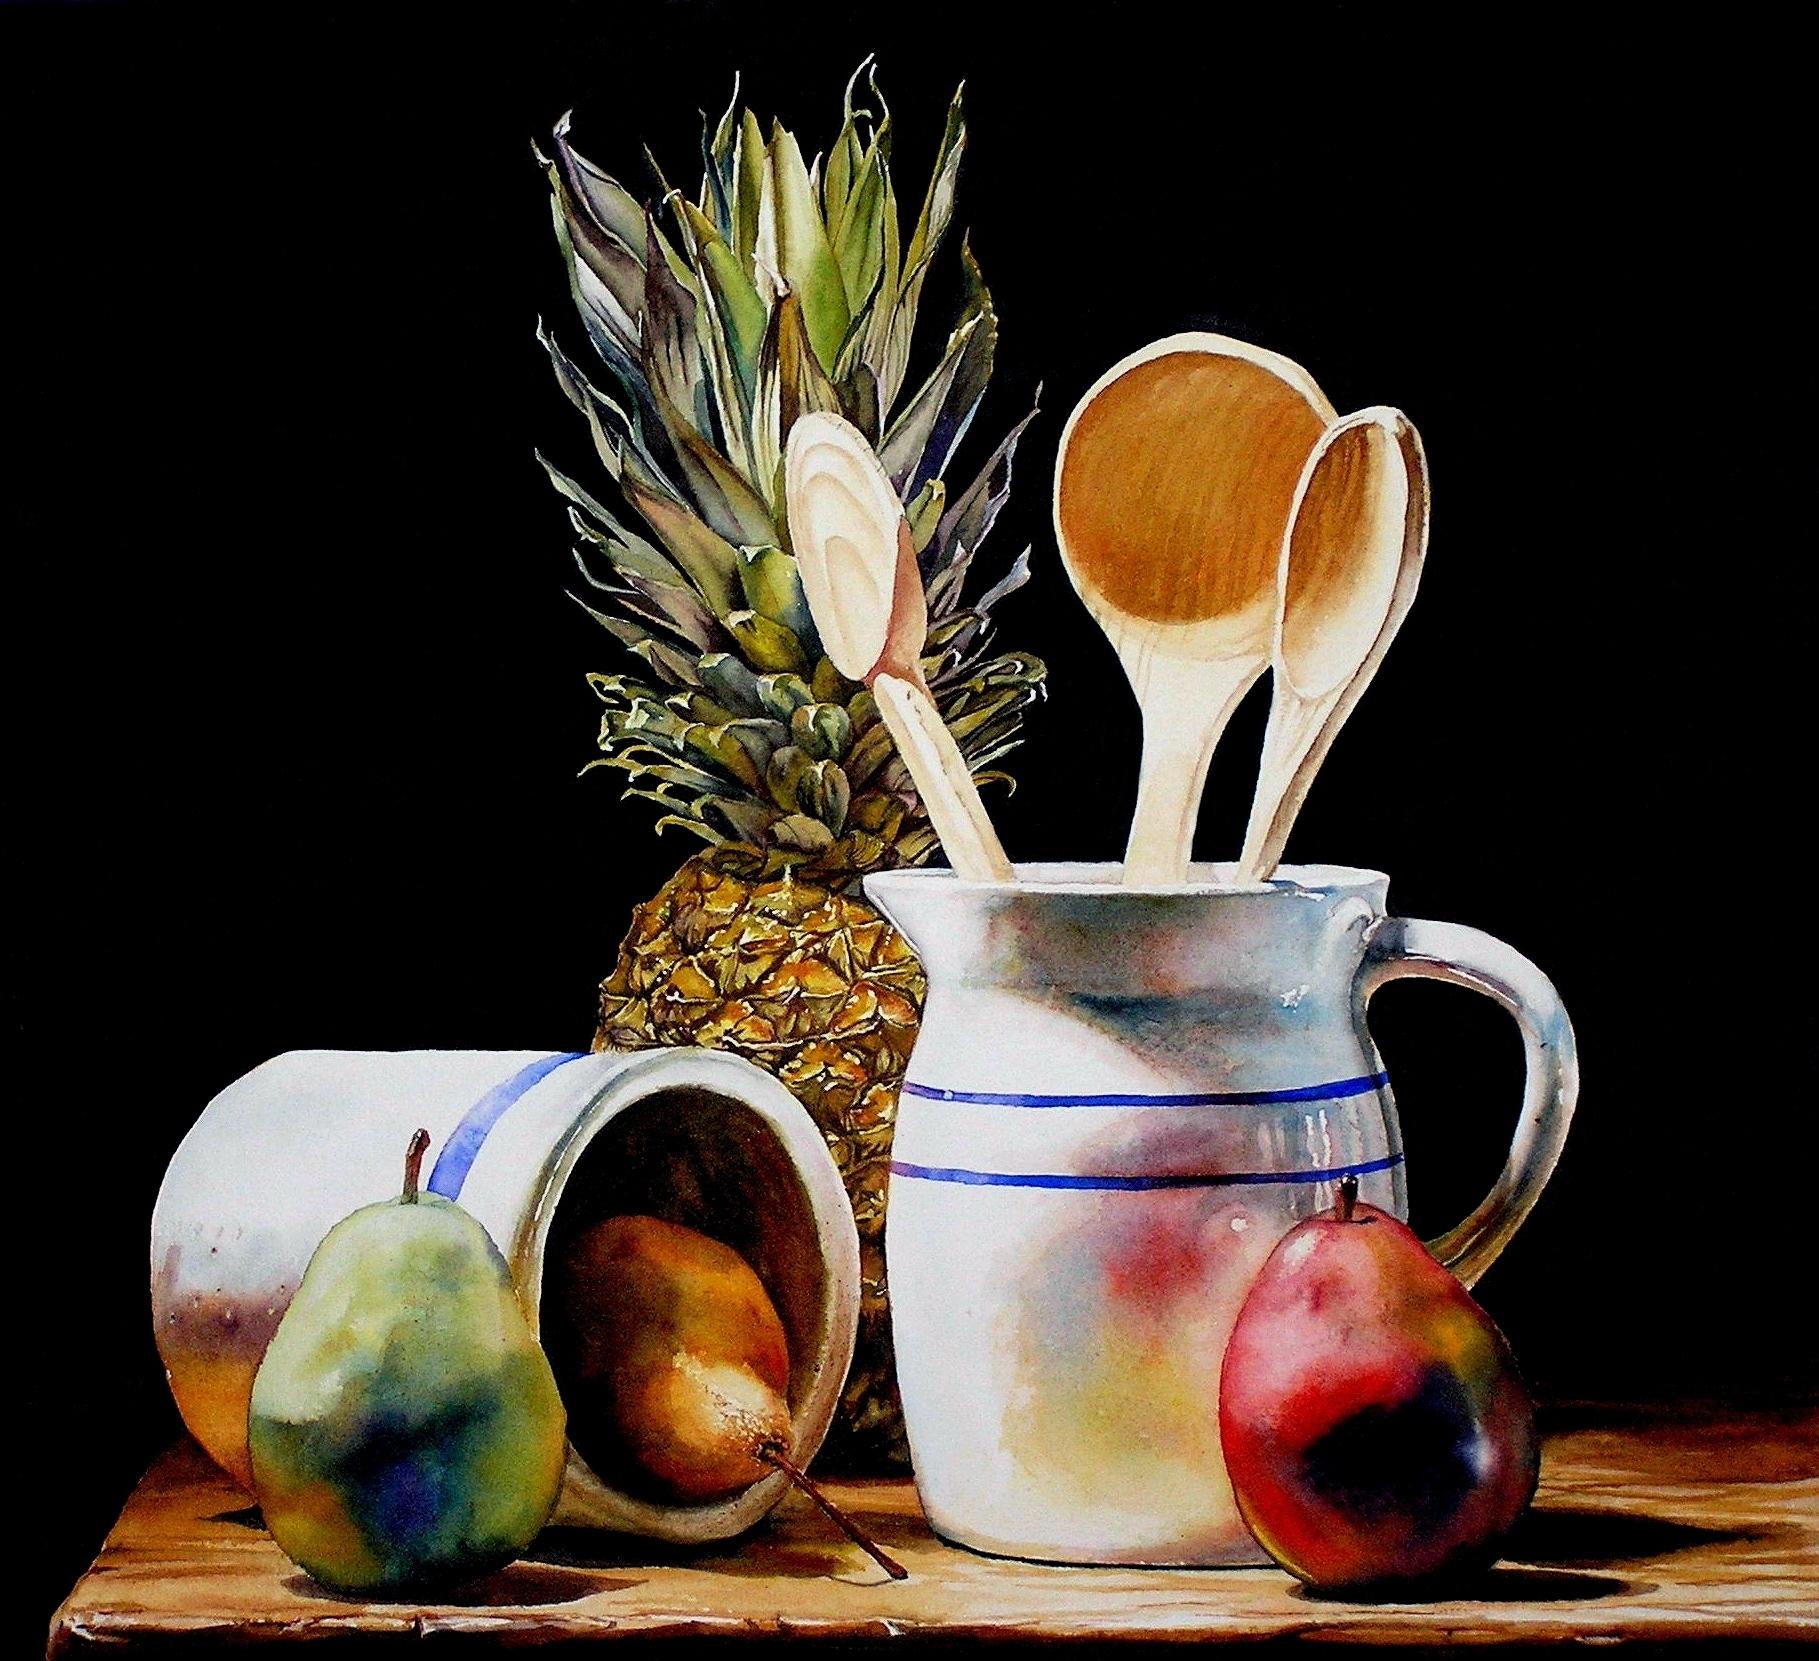 laurin McCracken Three Wooden Spoons 18x18